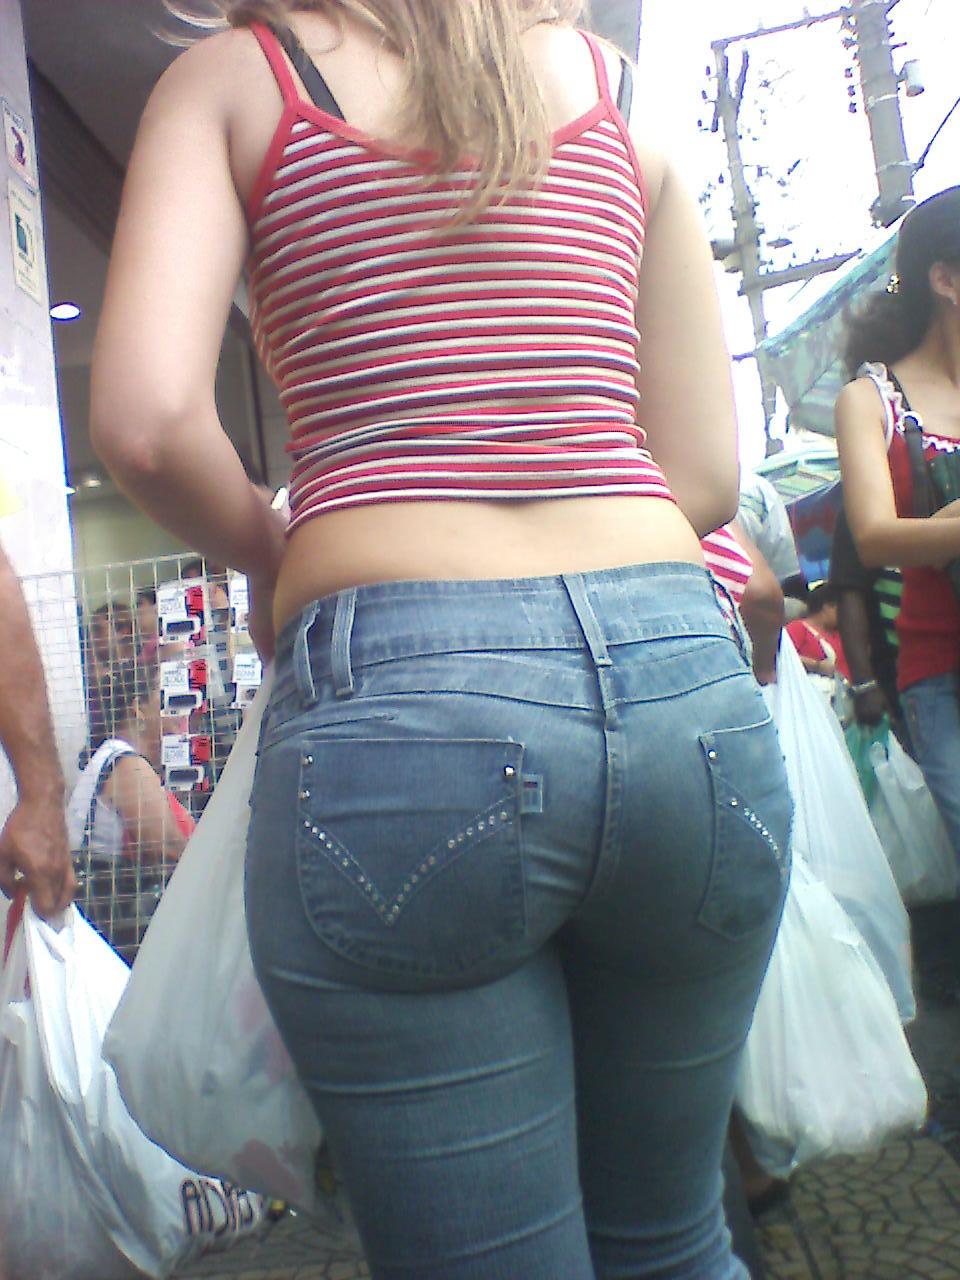 Hot Women In Short Jean Shorts